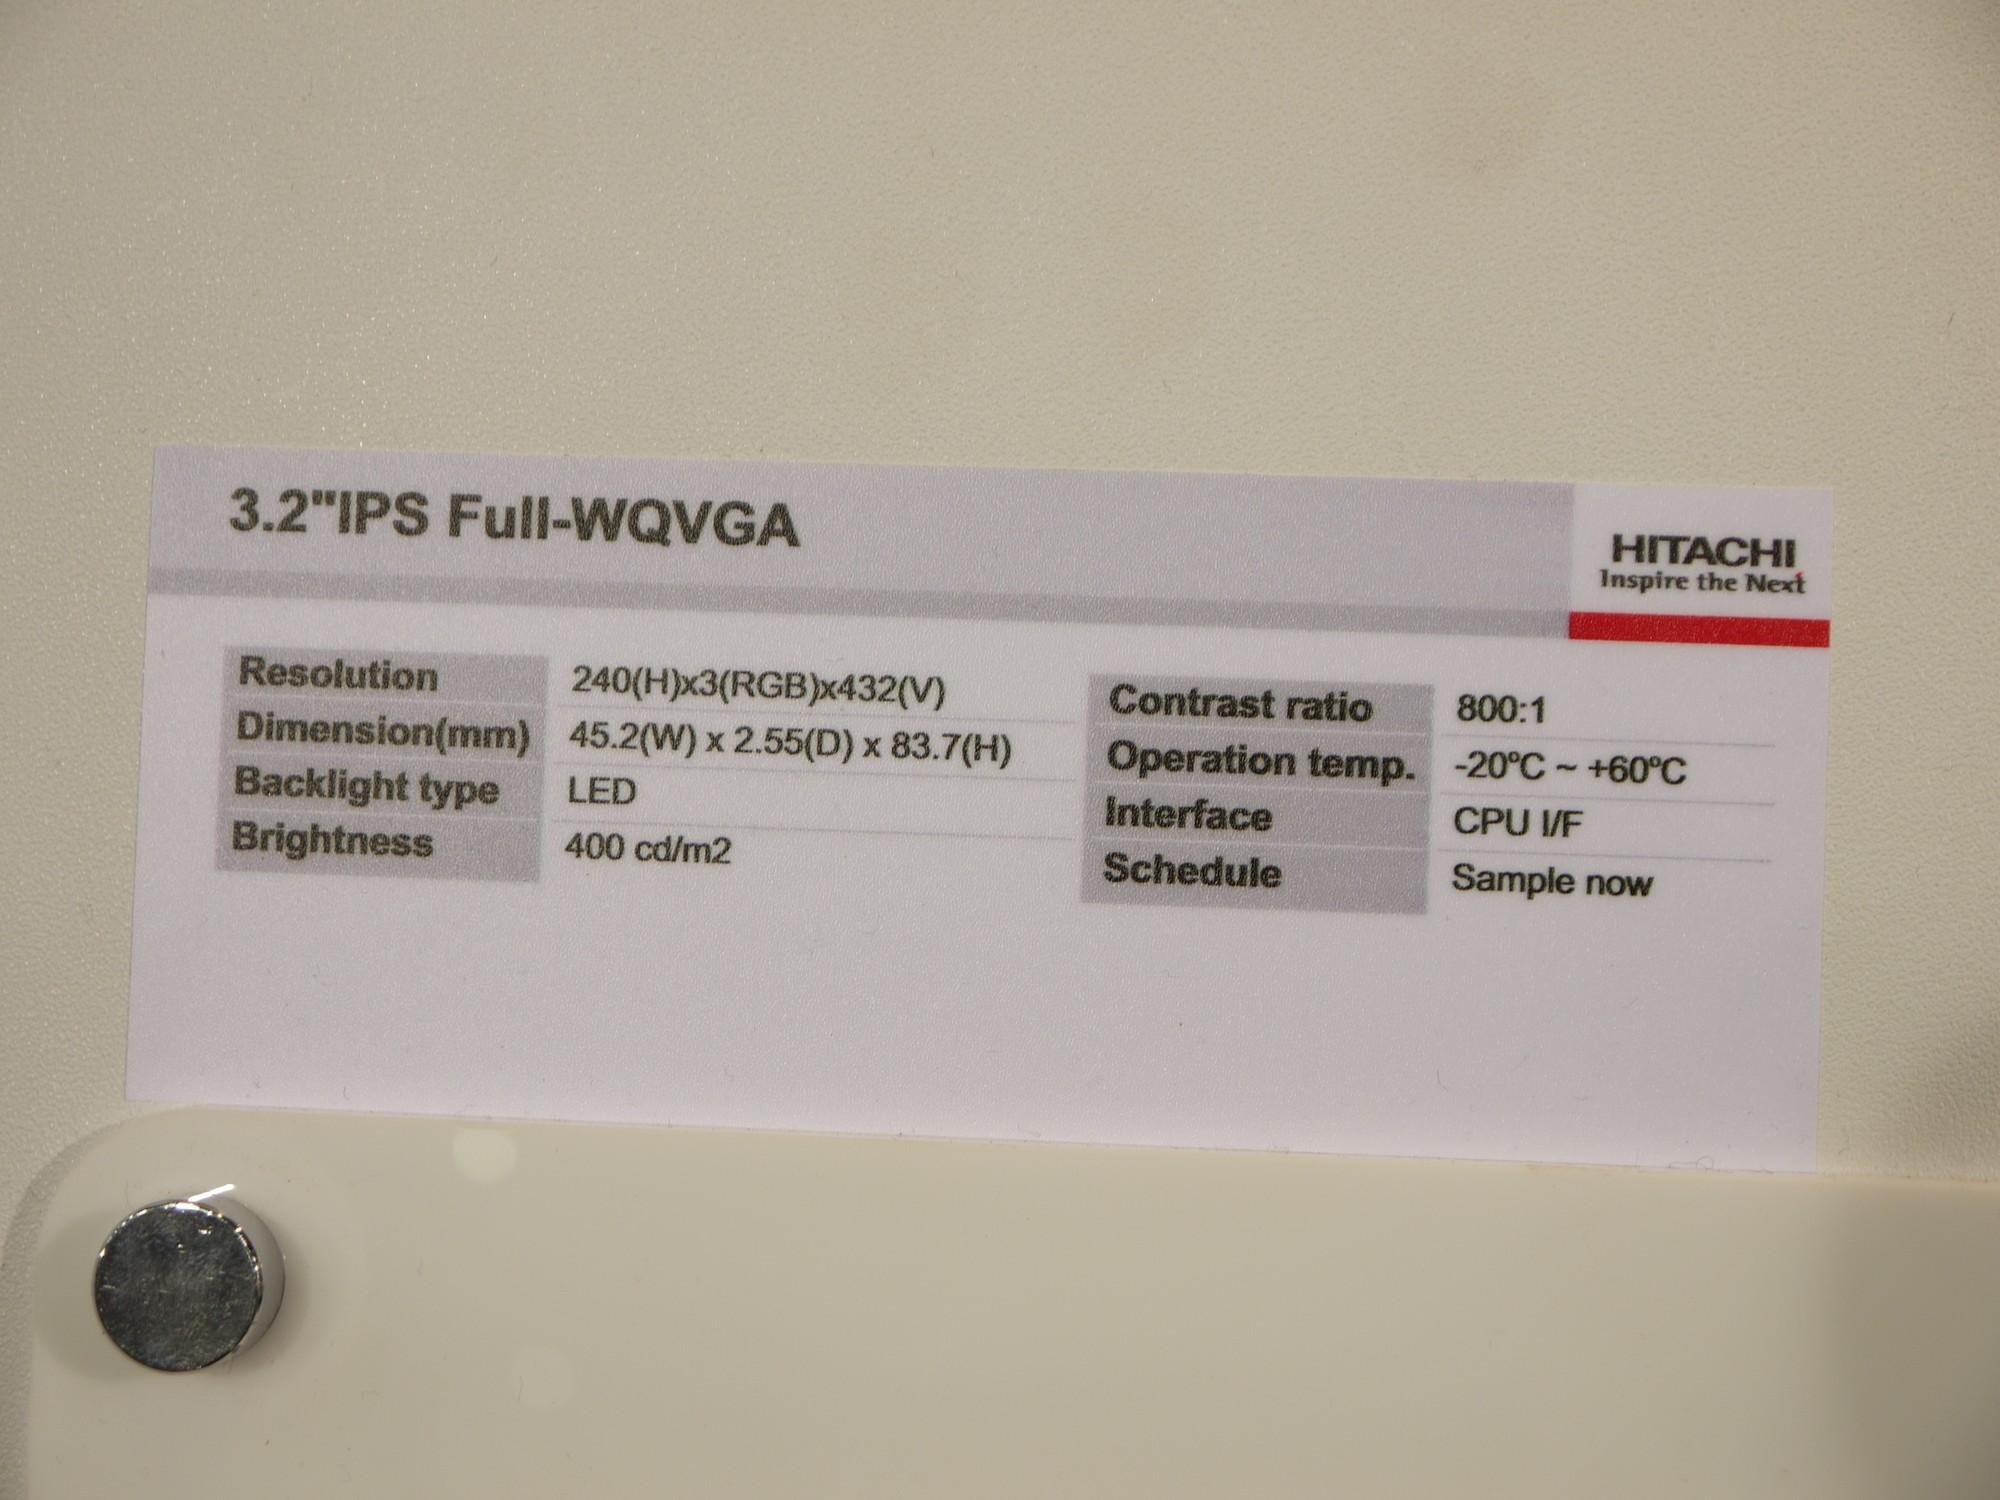 P1040098.JPG